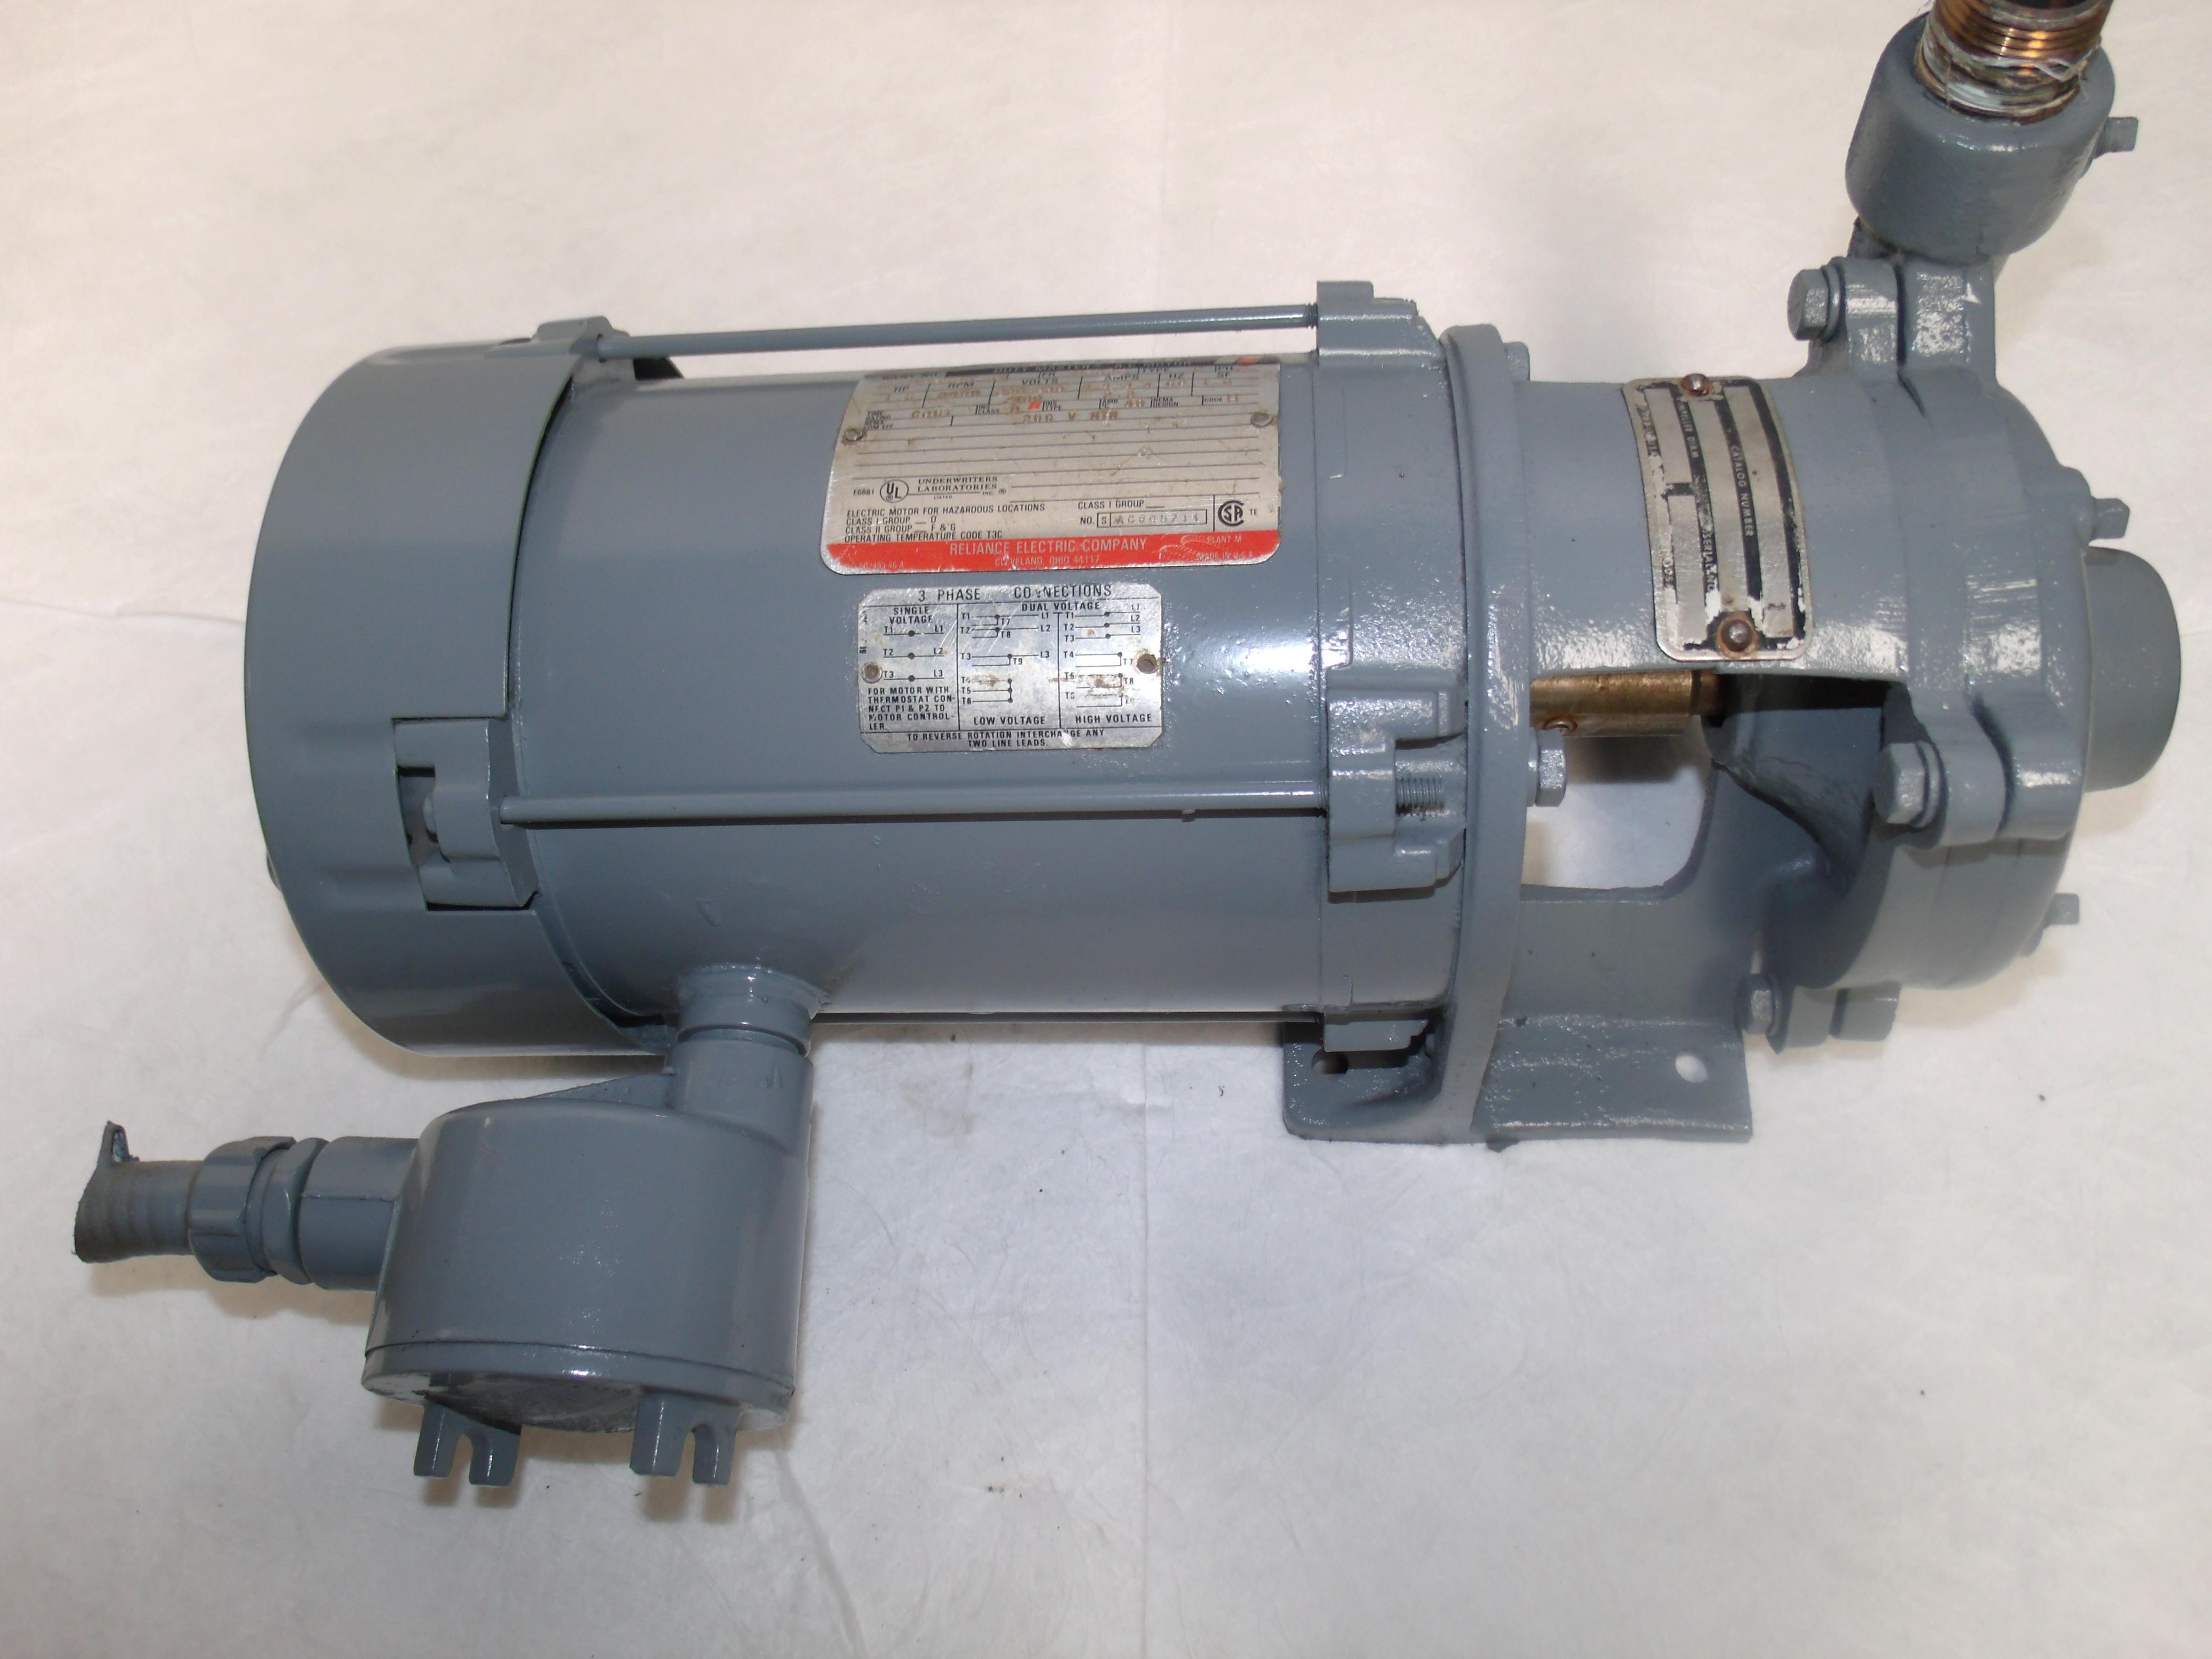 X007 Centrifugal Water Pump Reliance Motor